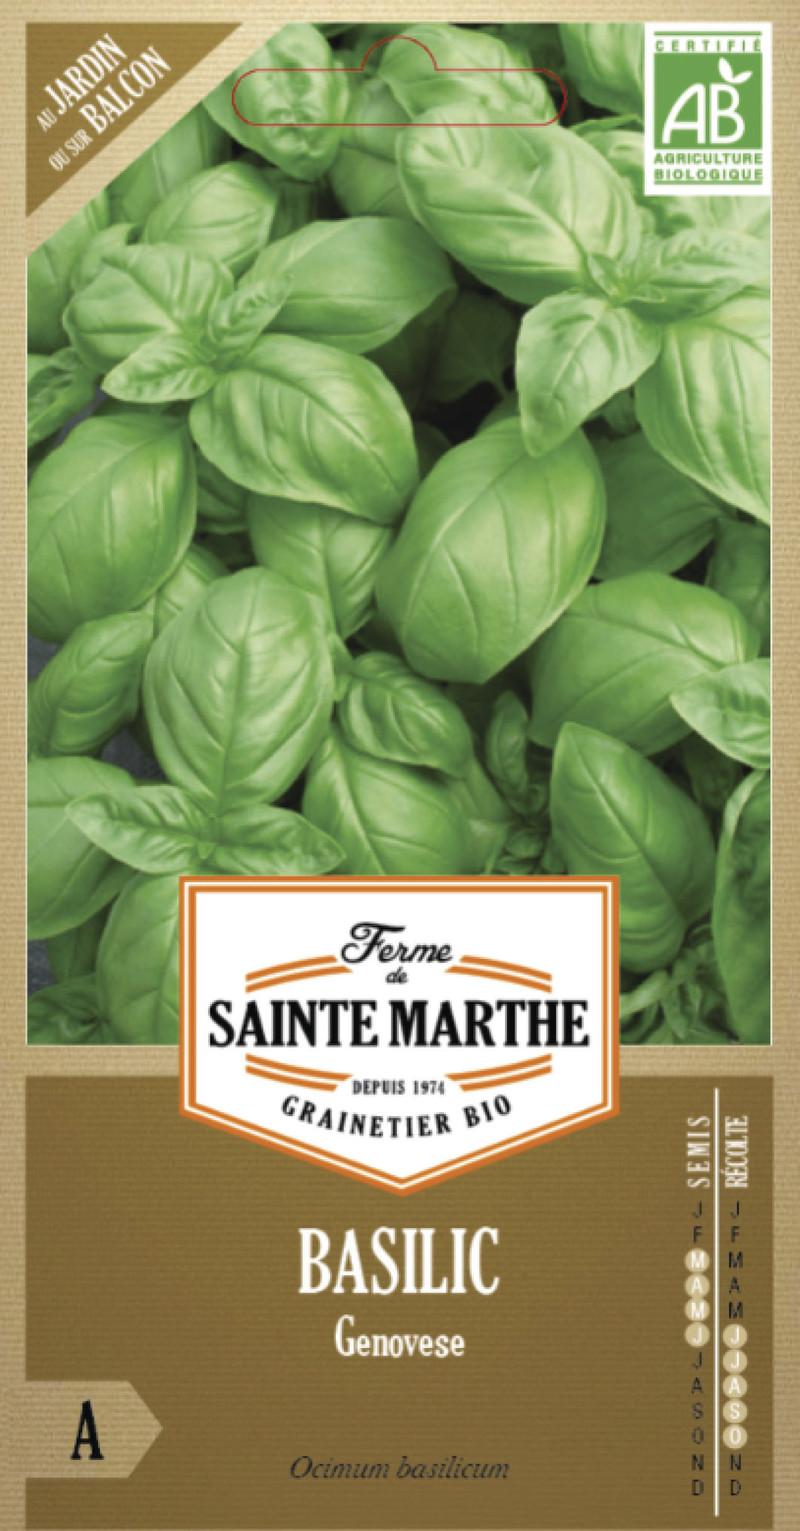 basilic genovese bio la ferme de sainte marthe graine semence aromatique sachet semis - Voir en grand